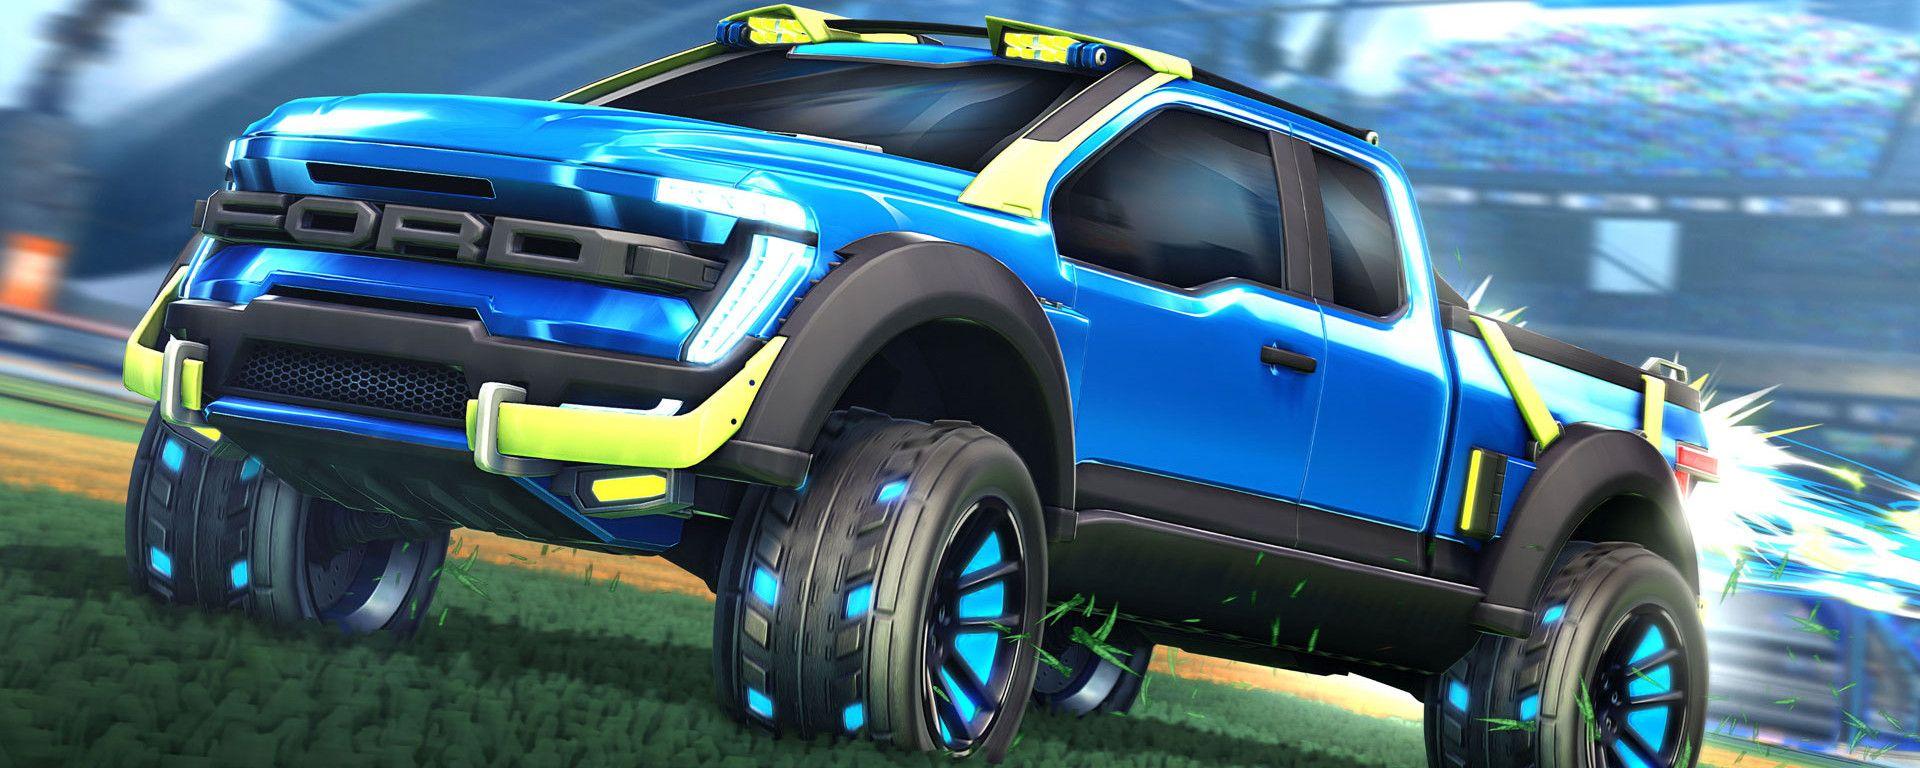 Ford e Rocket League insieme per il pick-up F-150